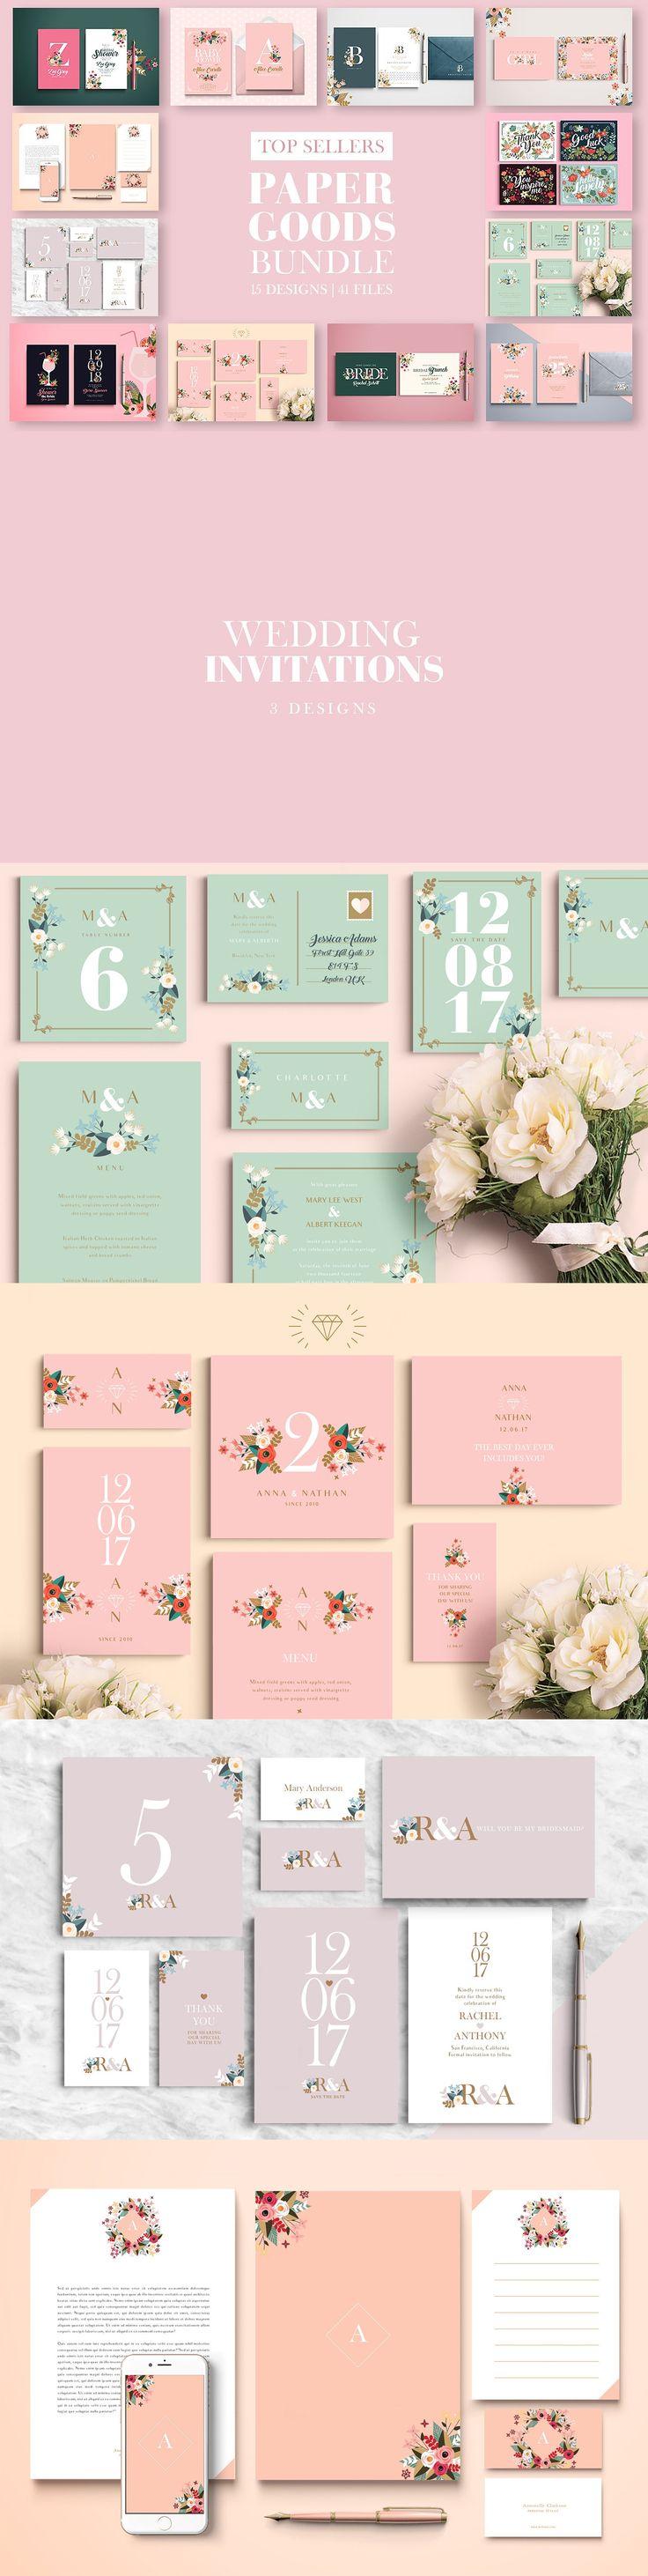 bridal shower invitations vector free%0A Top Sellers Paper Goods Bundle Templates PDF  AI    Bridal Shower InvitationsBirthday  InvitationsInvitation